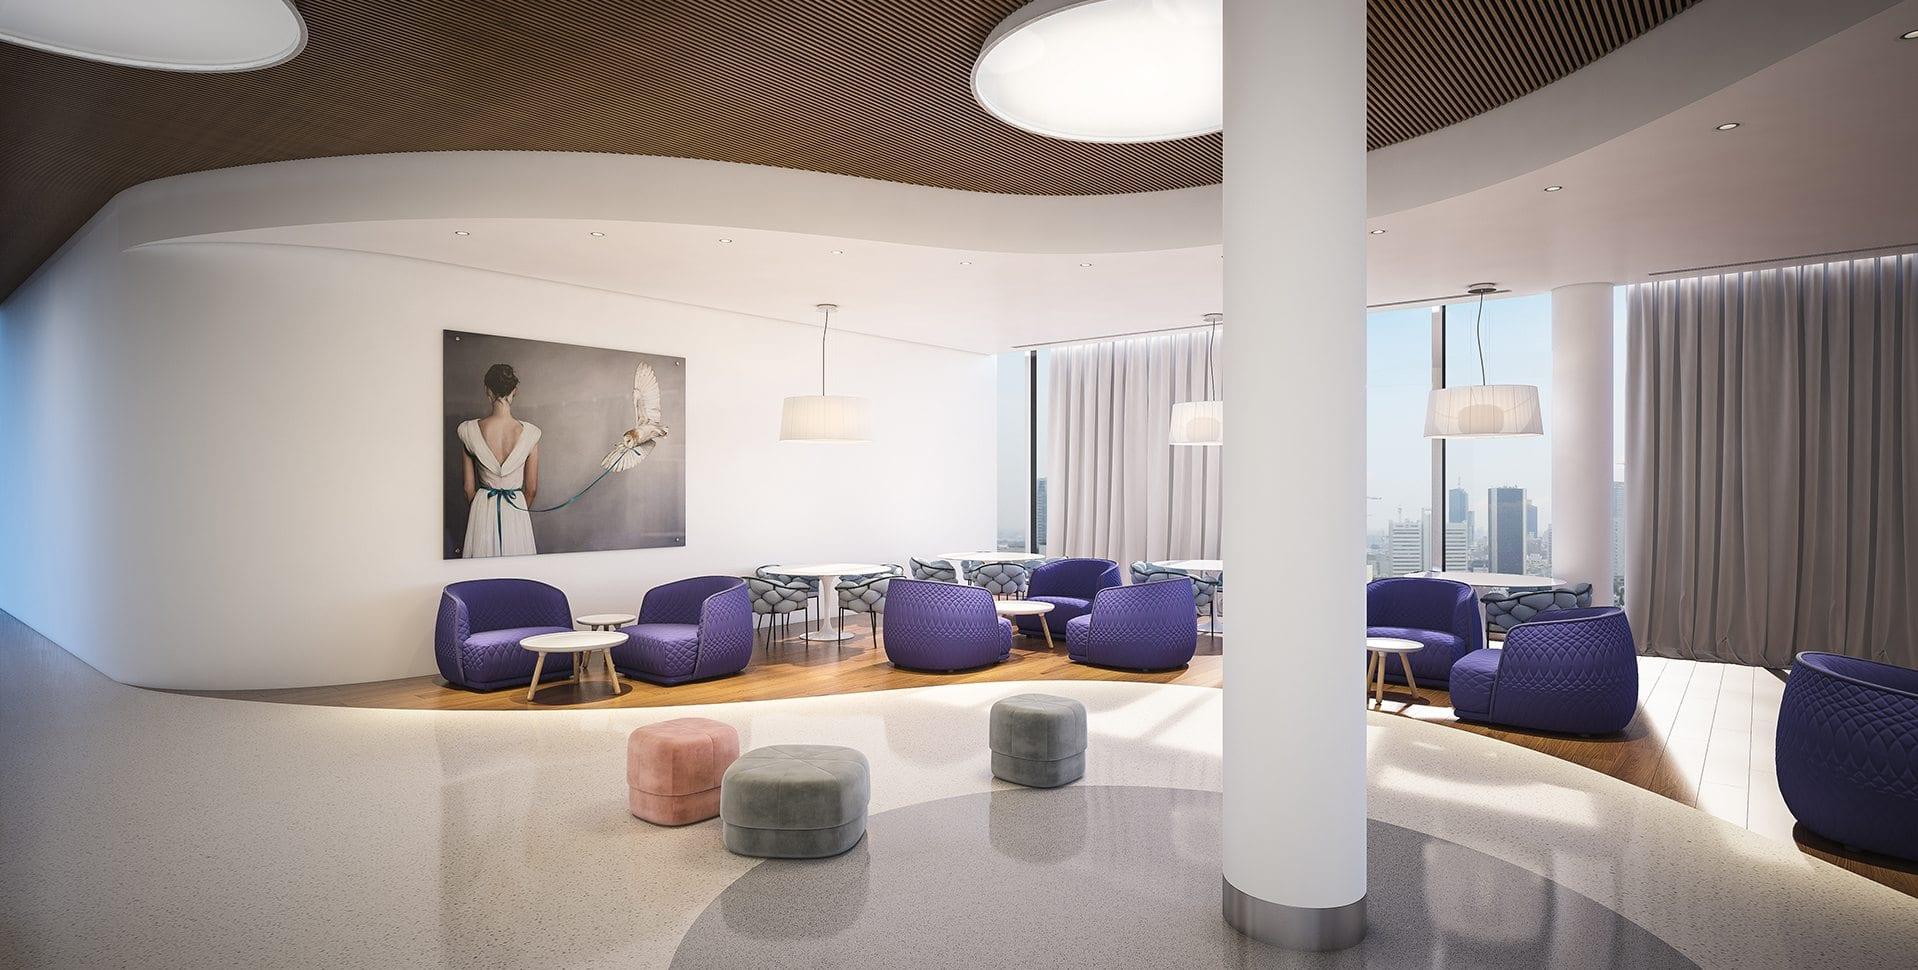 Maayan-Golan_Architectural-Visualization_ clinic-interior-visualization_ floor-lobby_naara-medical-center_habarzel-tel-aviv_05